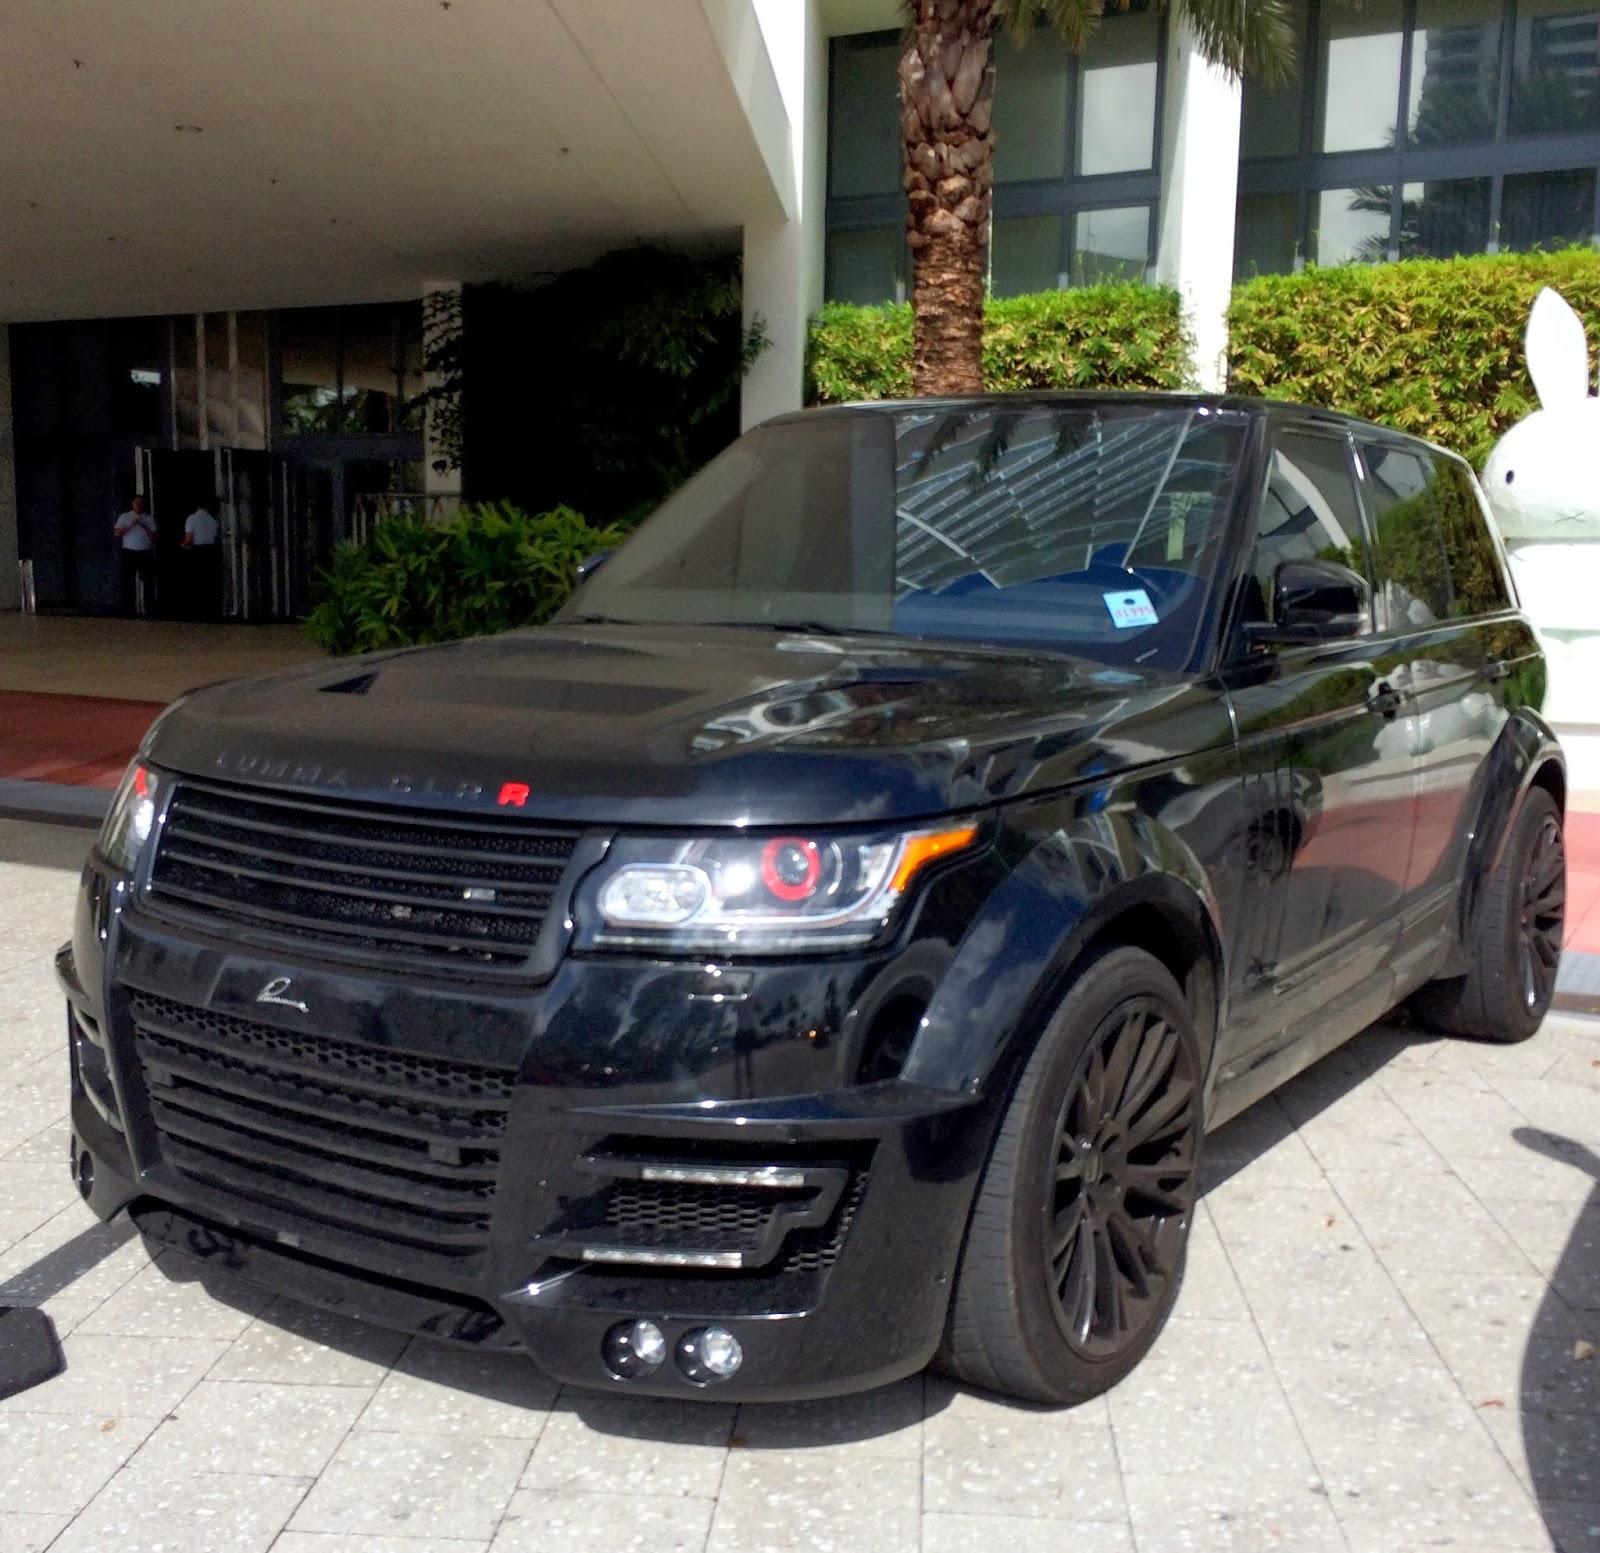 Range Rover Lumma Clr R Exotic Cars On The Streets Of Miami